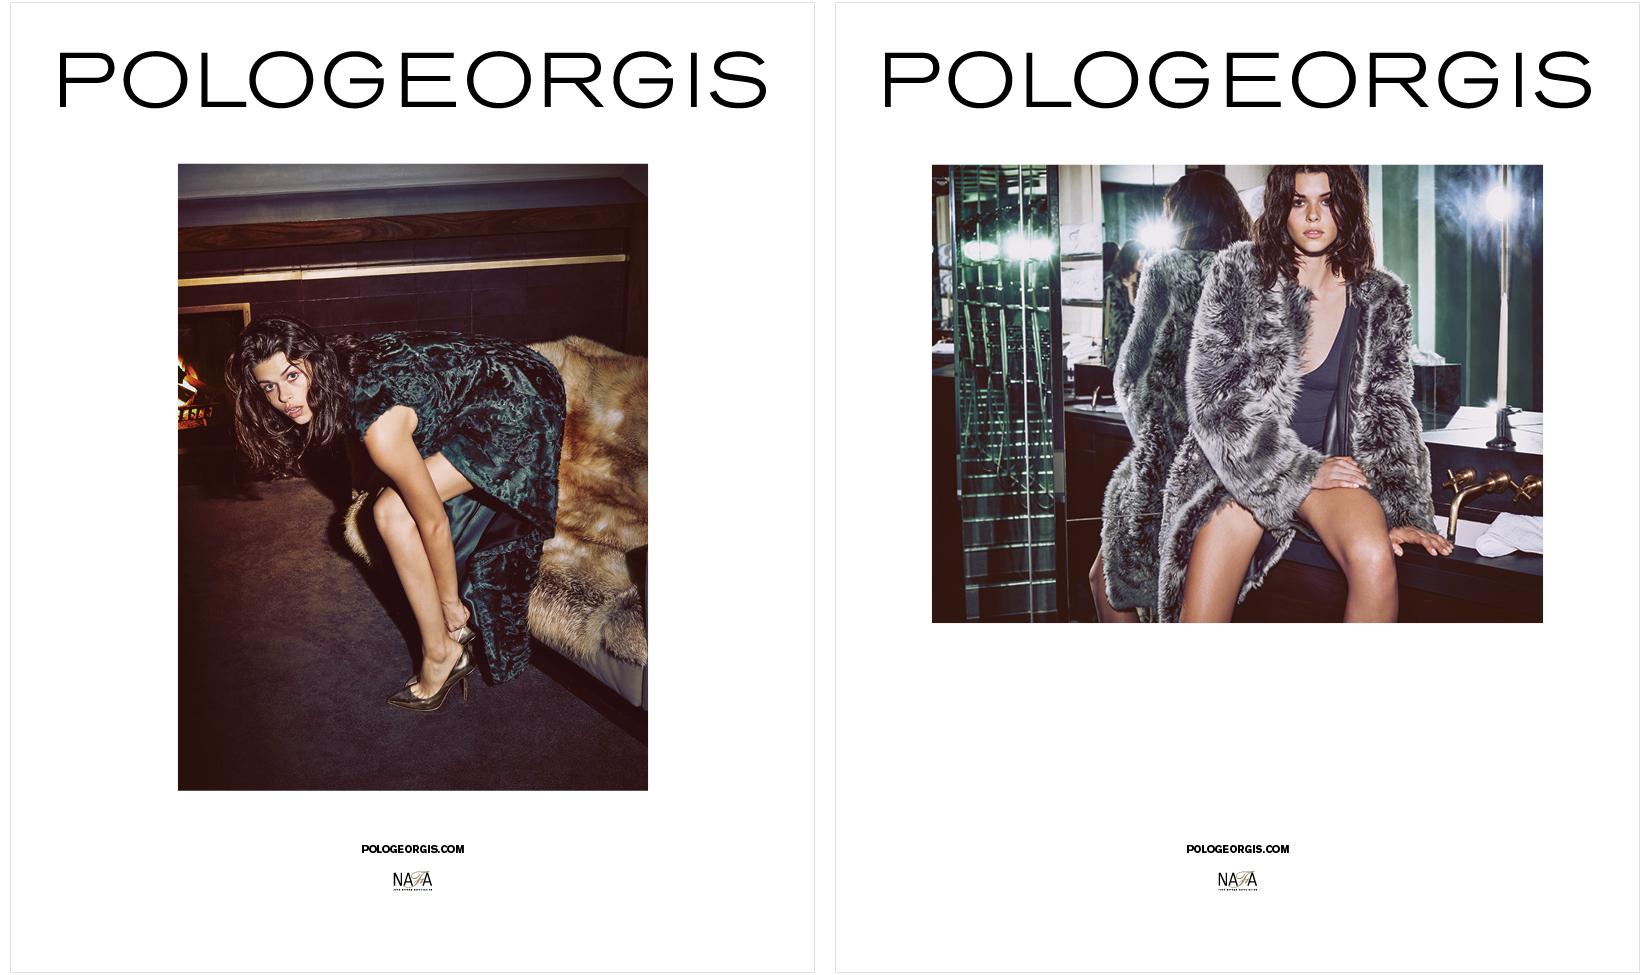 DTE Studio's creative direction for Pologeorgis advertising campaign.